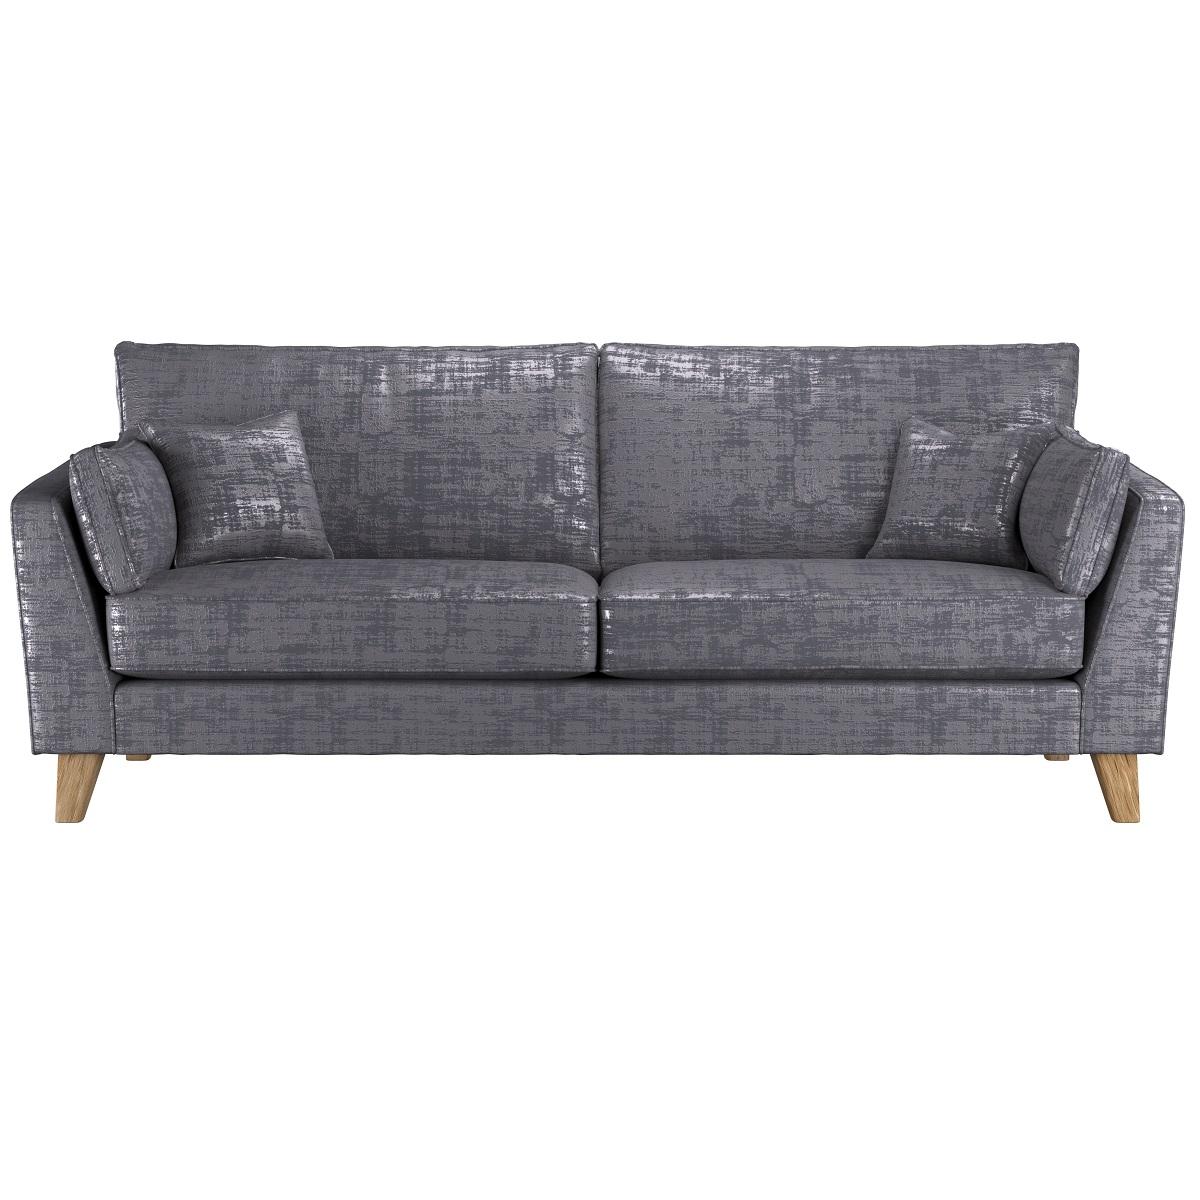 Quincy 4 Seater Sofa